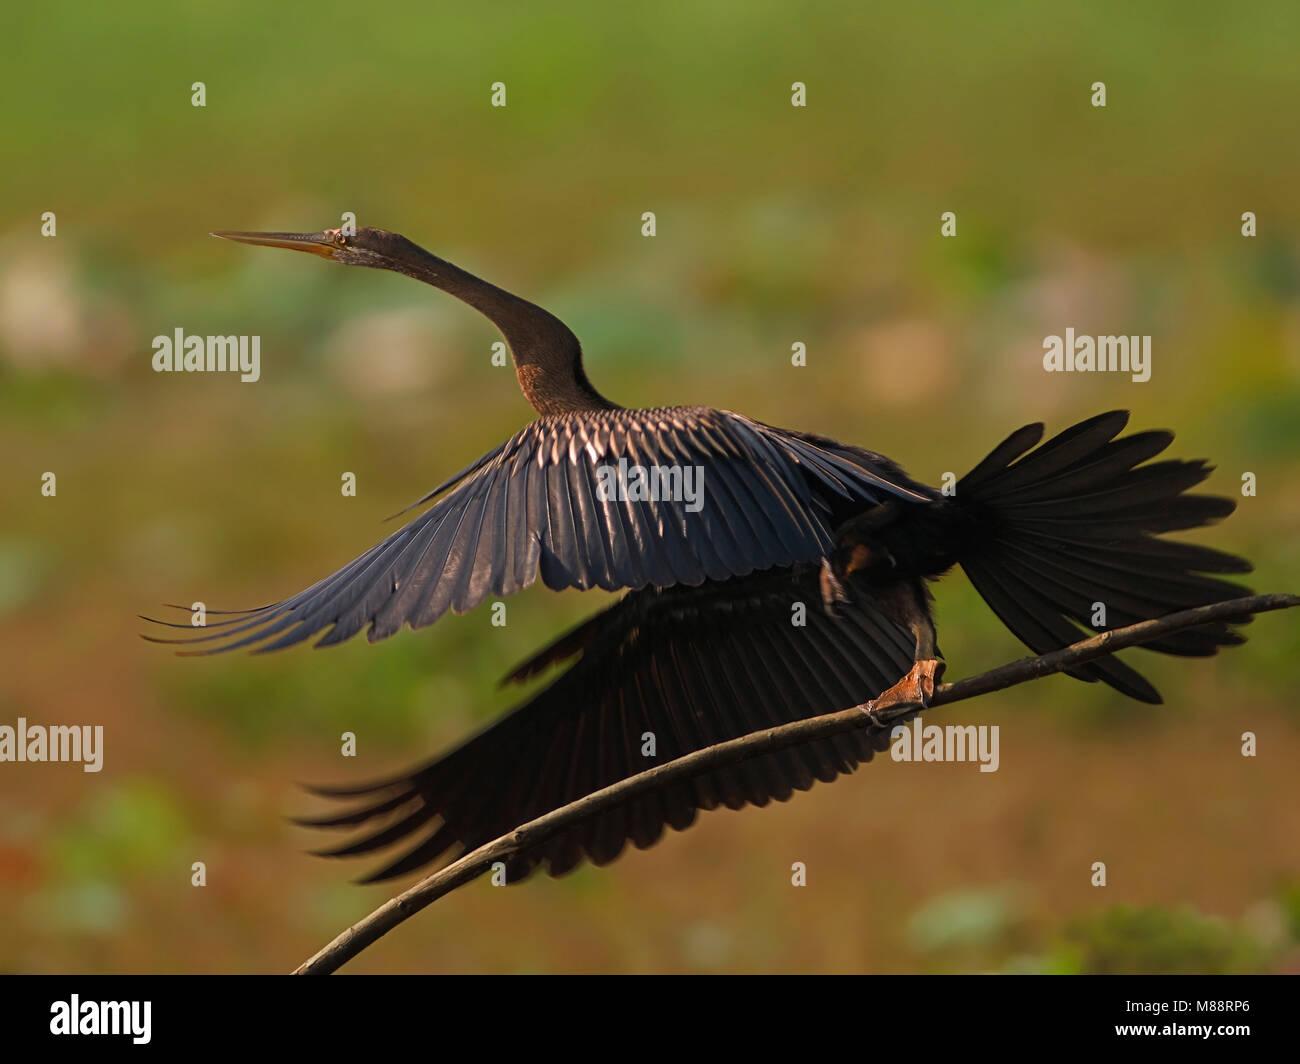 Opvliegende Indische Slangenhalsvogel, Oriental Darter setting off - Stock Image